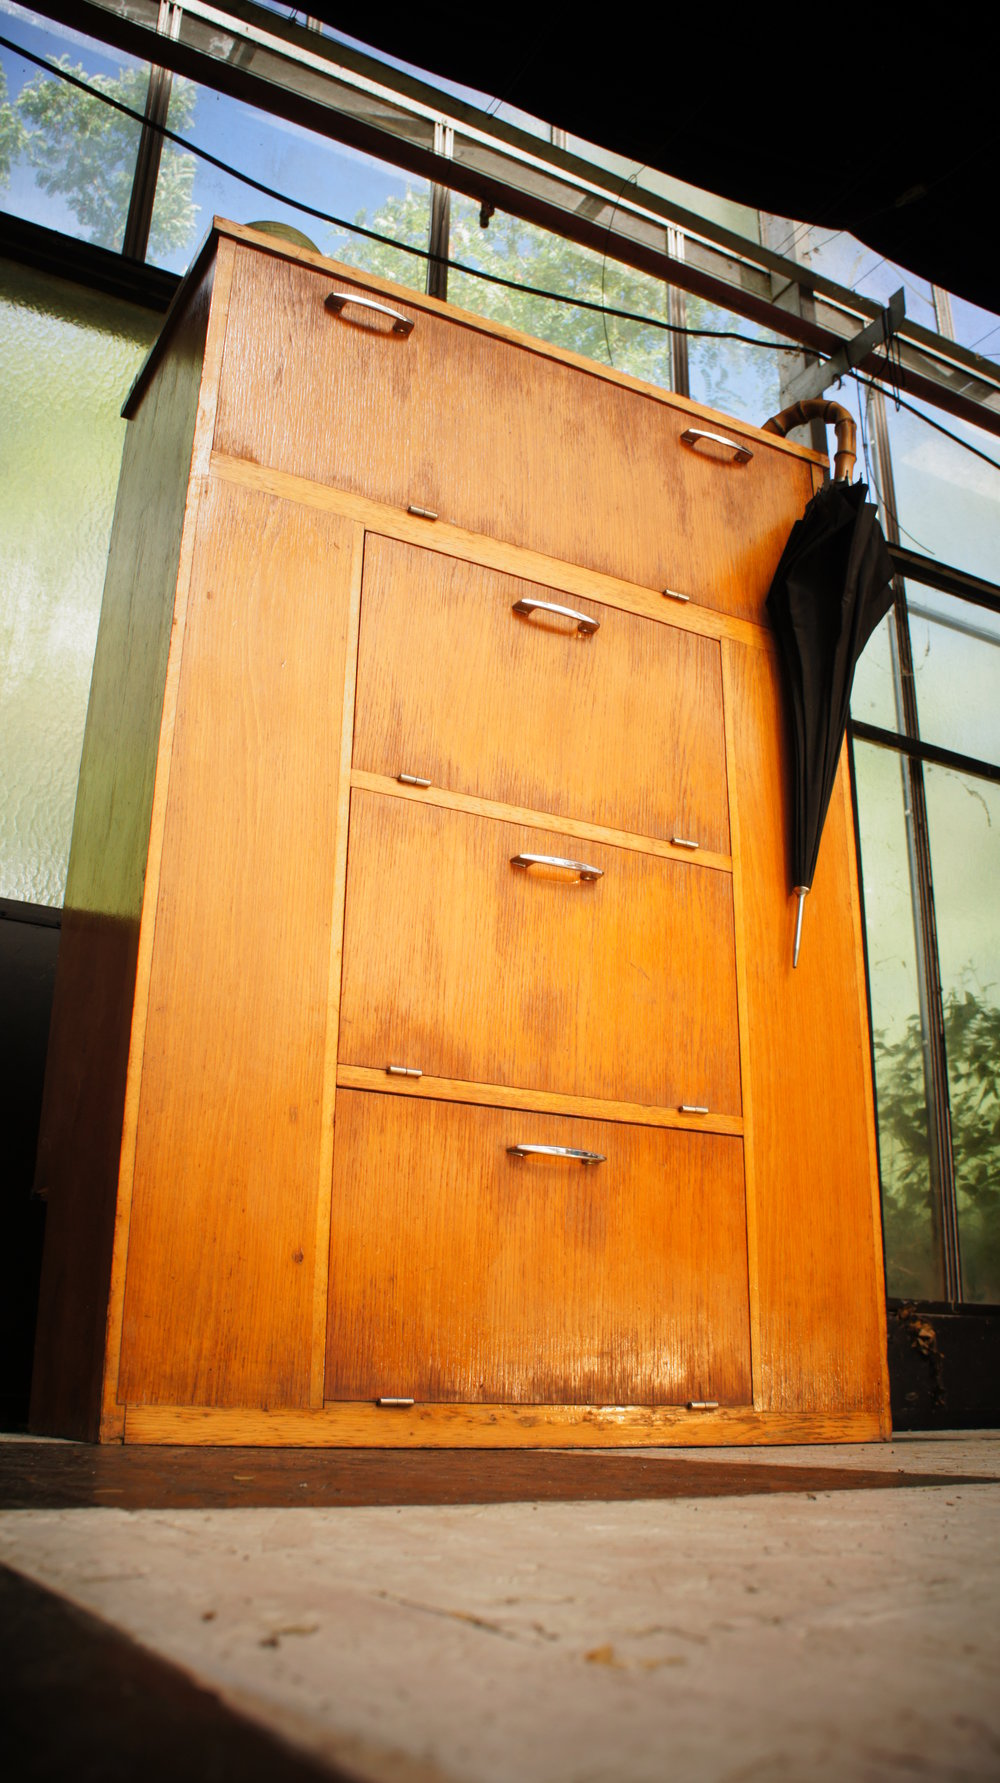 meuble de metier architecte atelier masaill. Black Bedroom Furniture Sets. Home Design Ideas